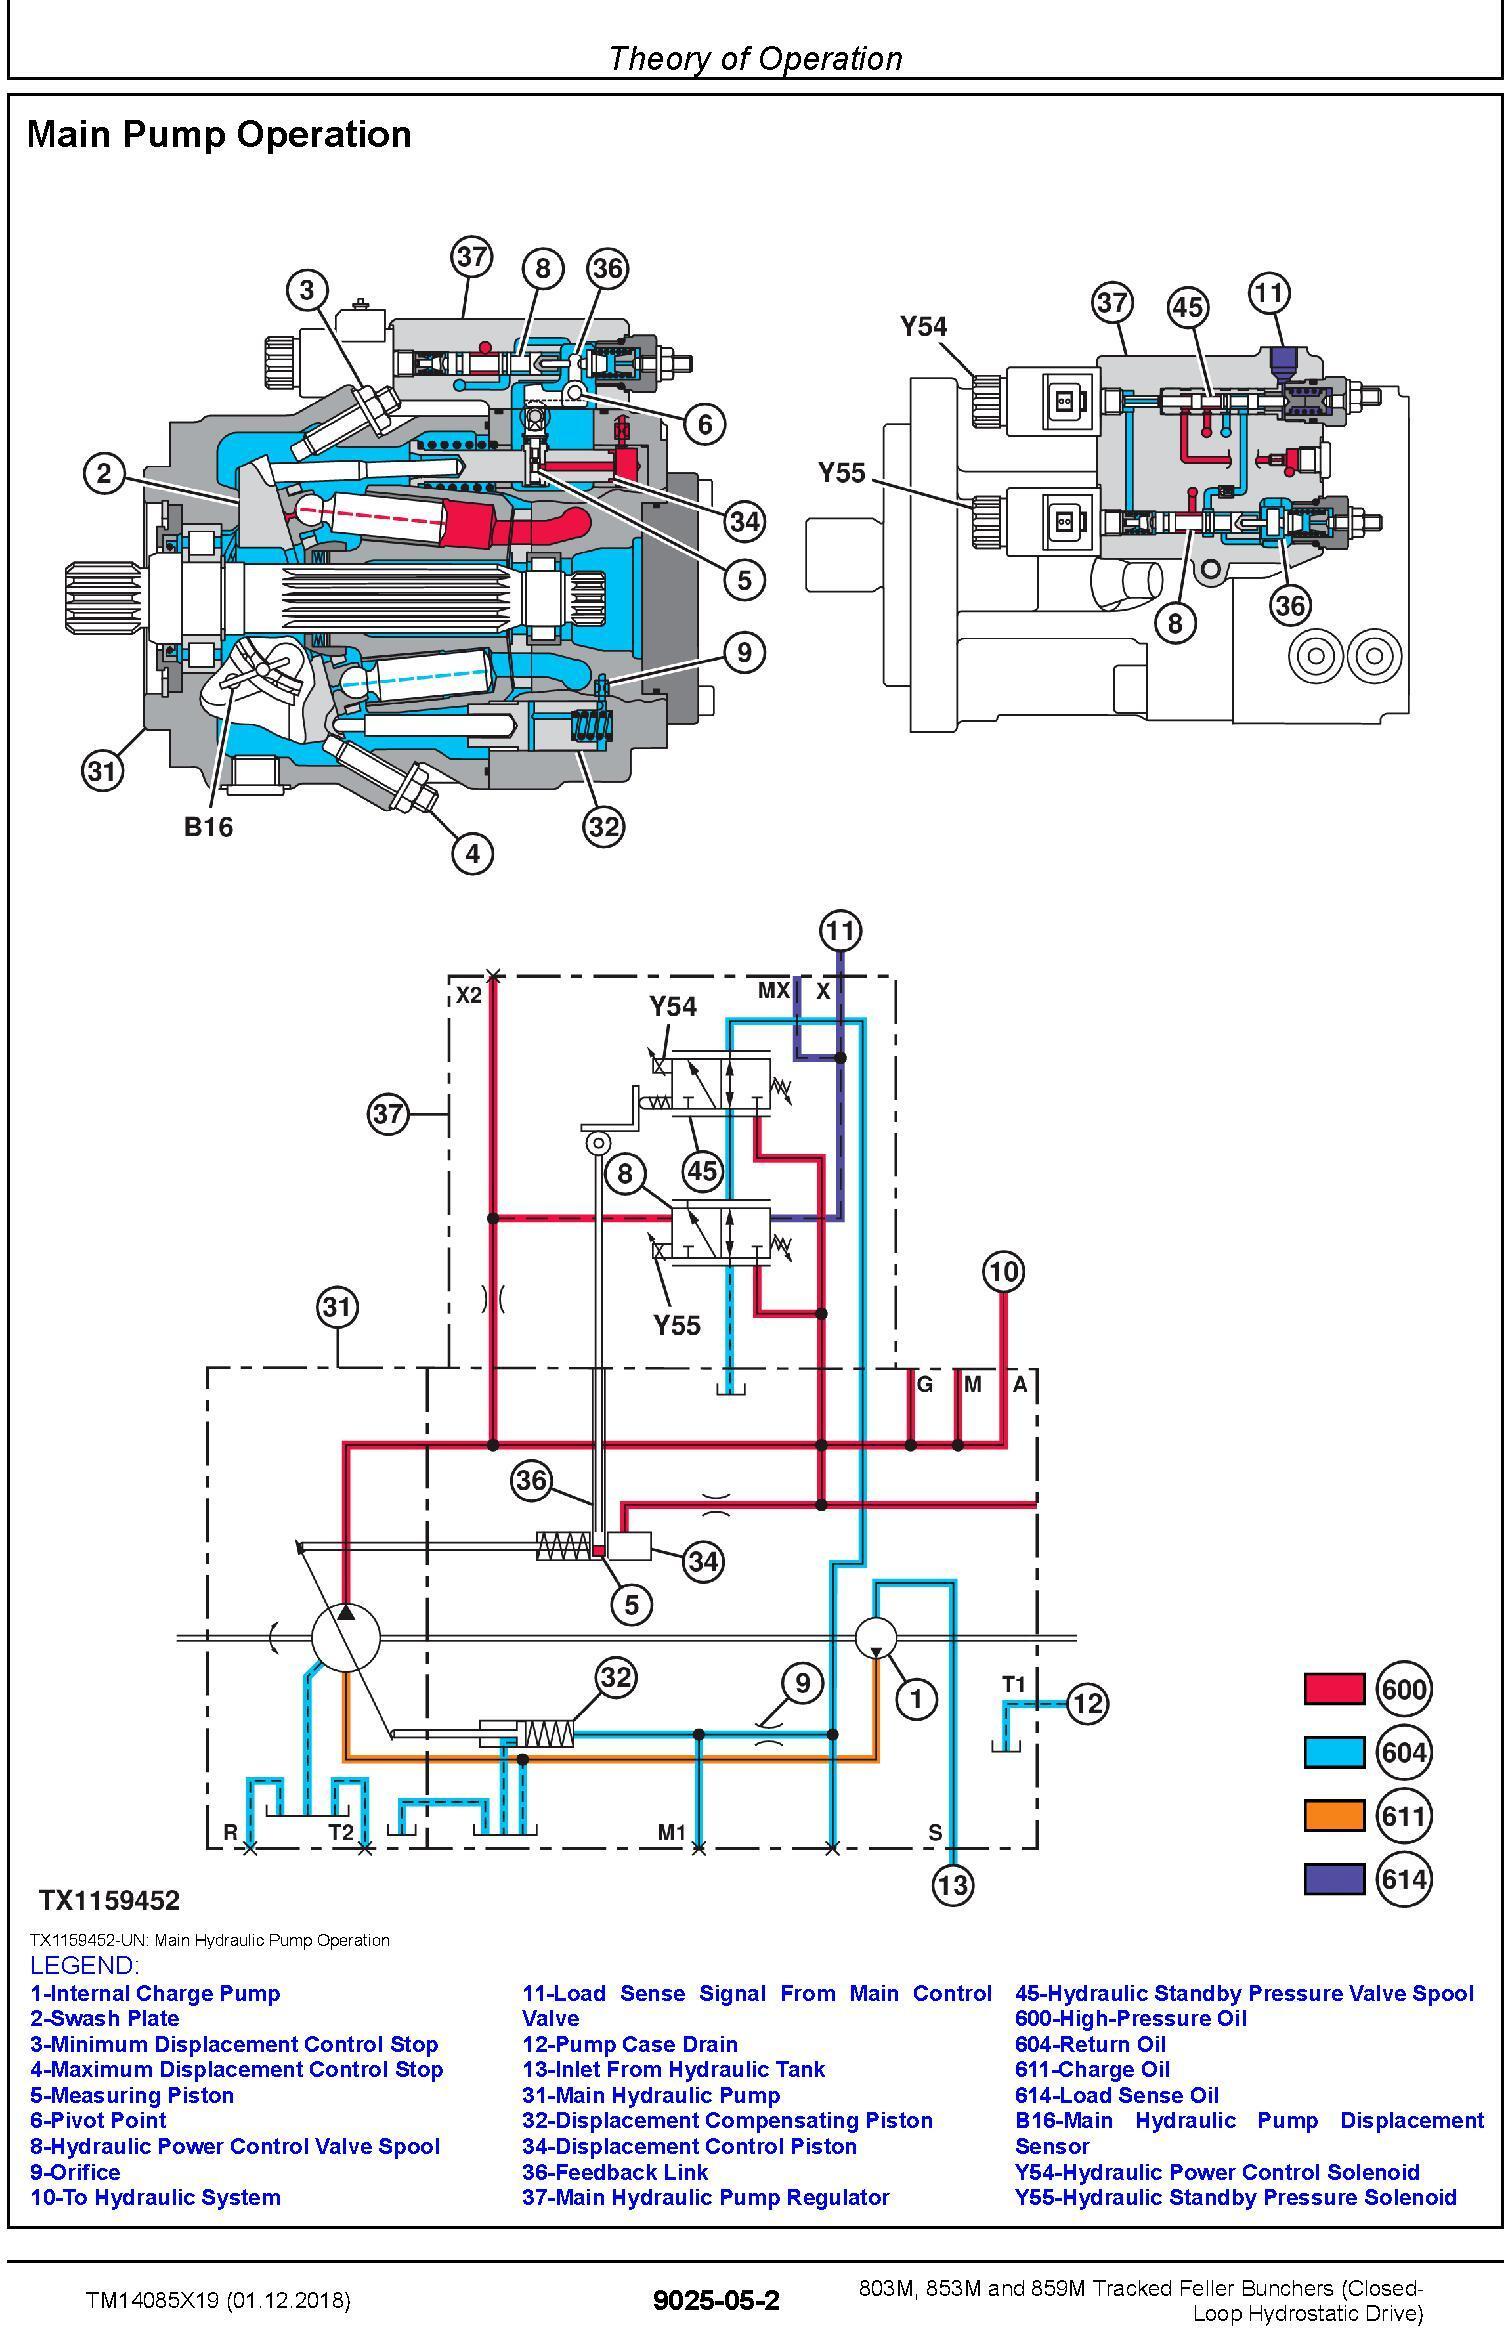 John Deere 803M,853M (SN.F293917-,L343918-) Feller Buncher(Closed-Loop) Diagnostic Manual TM14085X19 - 2